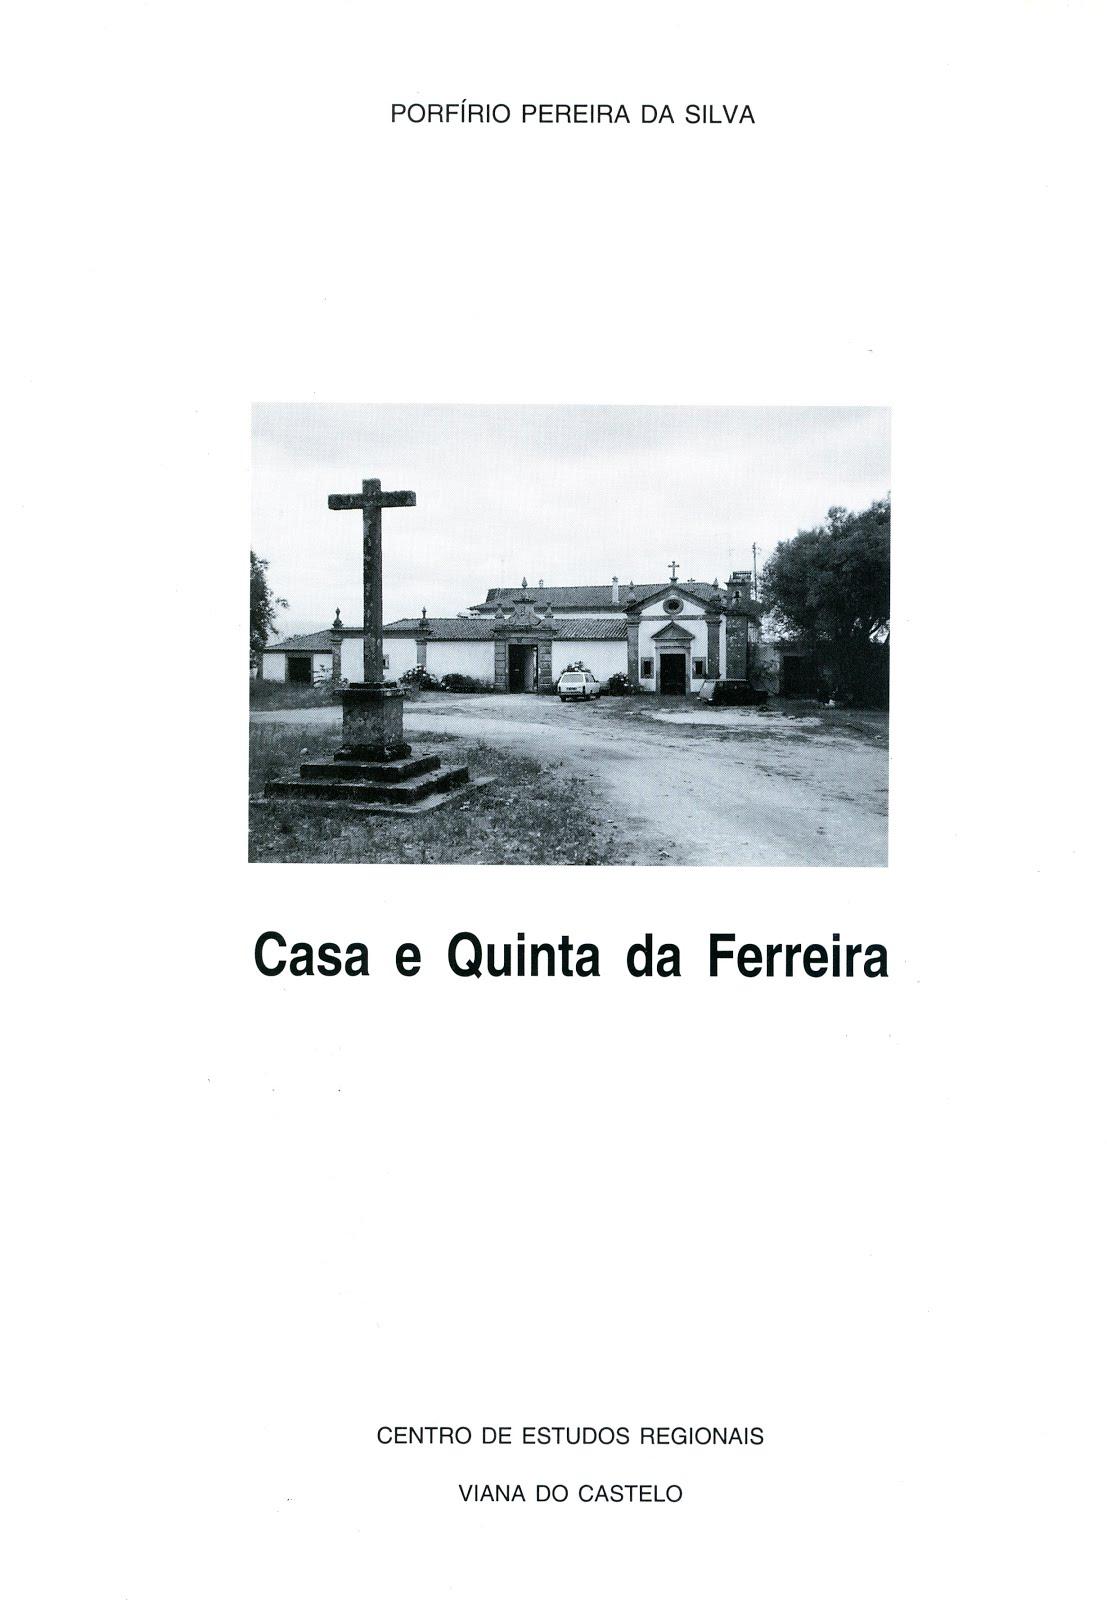 CASA E QUINTA DA FERREIRA